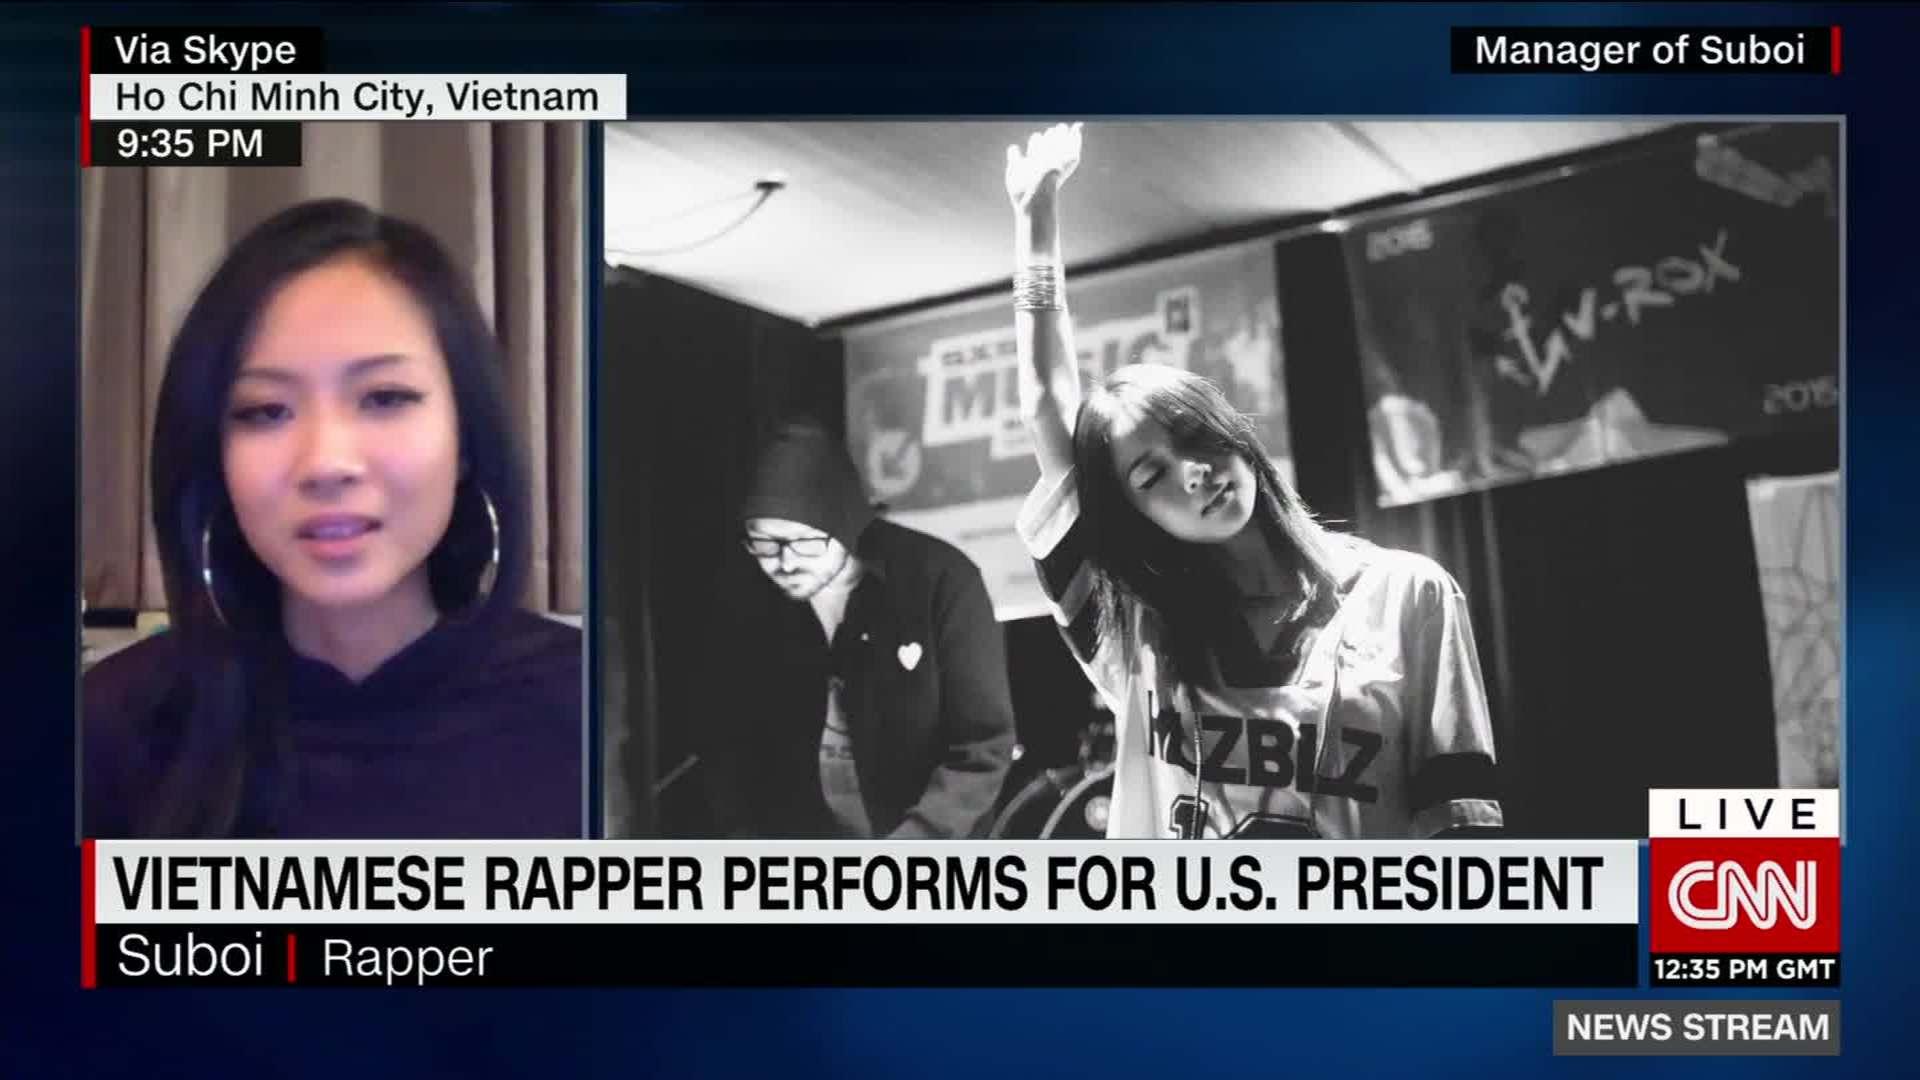 Vietnamese rap artist performs for President Obama - CNN Video